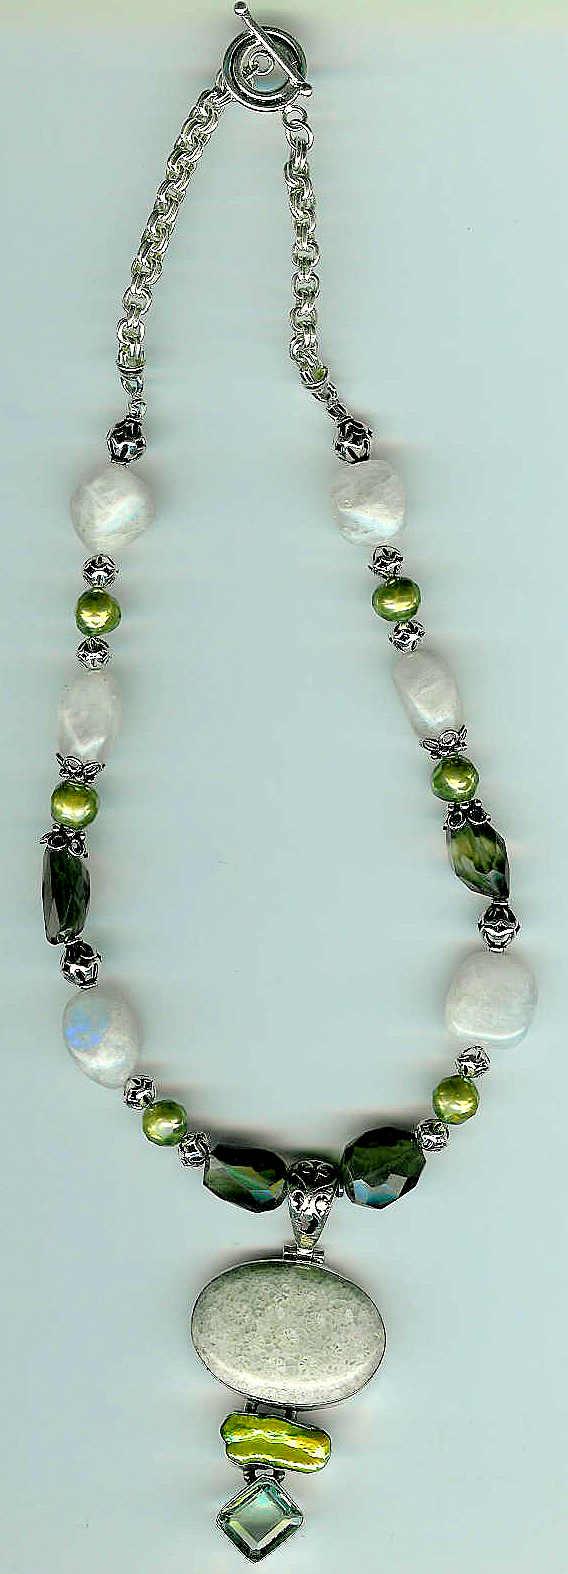 29. Fossilled Coral, Green Amethyst + Biwa Pearl pendant -Topaz, Moonstone, Pearls + Bali SS